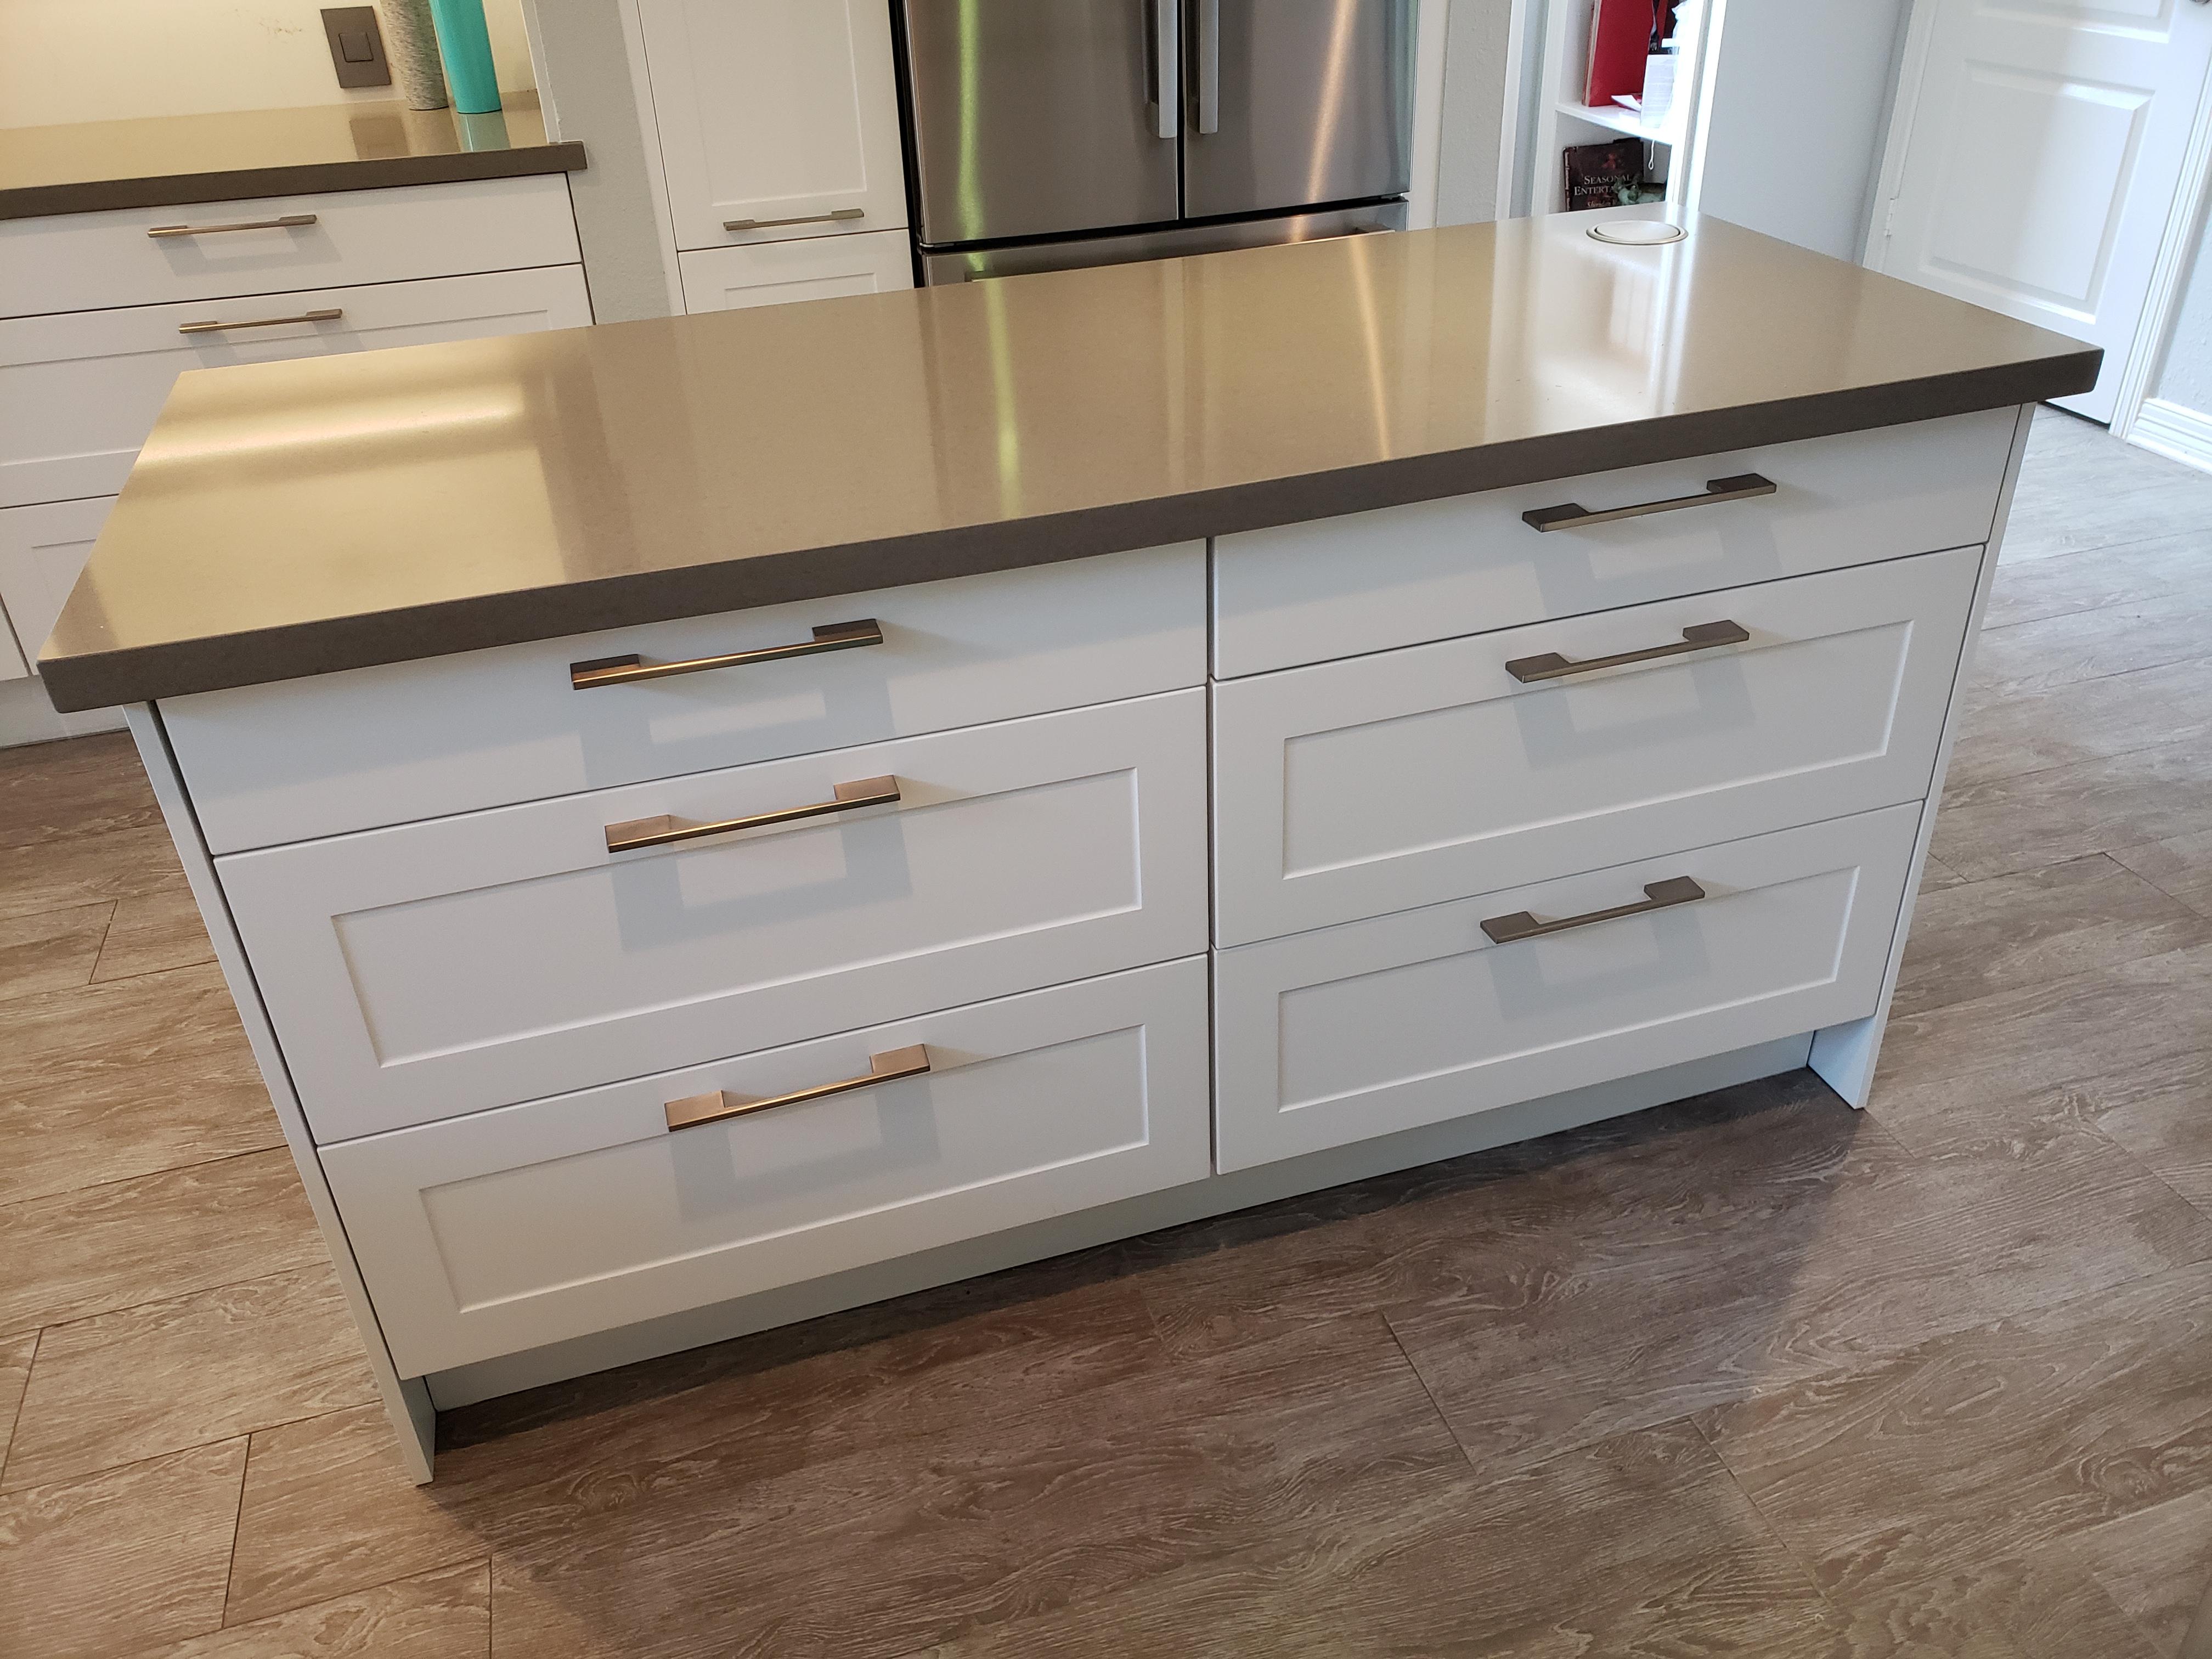 Island kitchen cabinets/ Houston